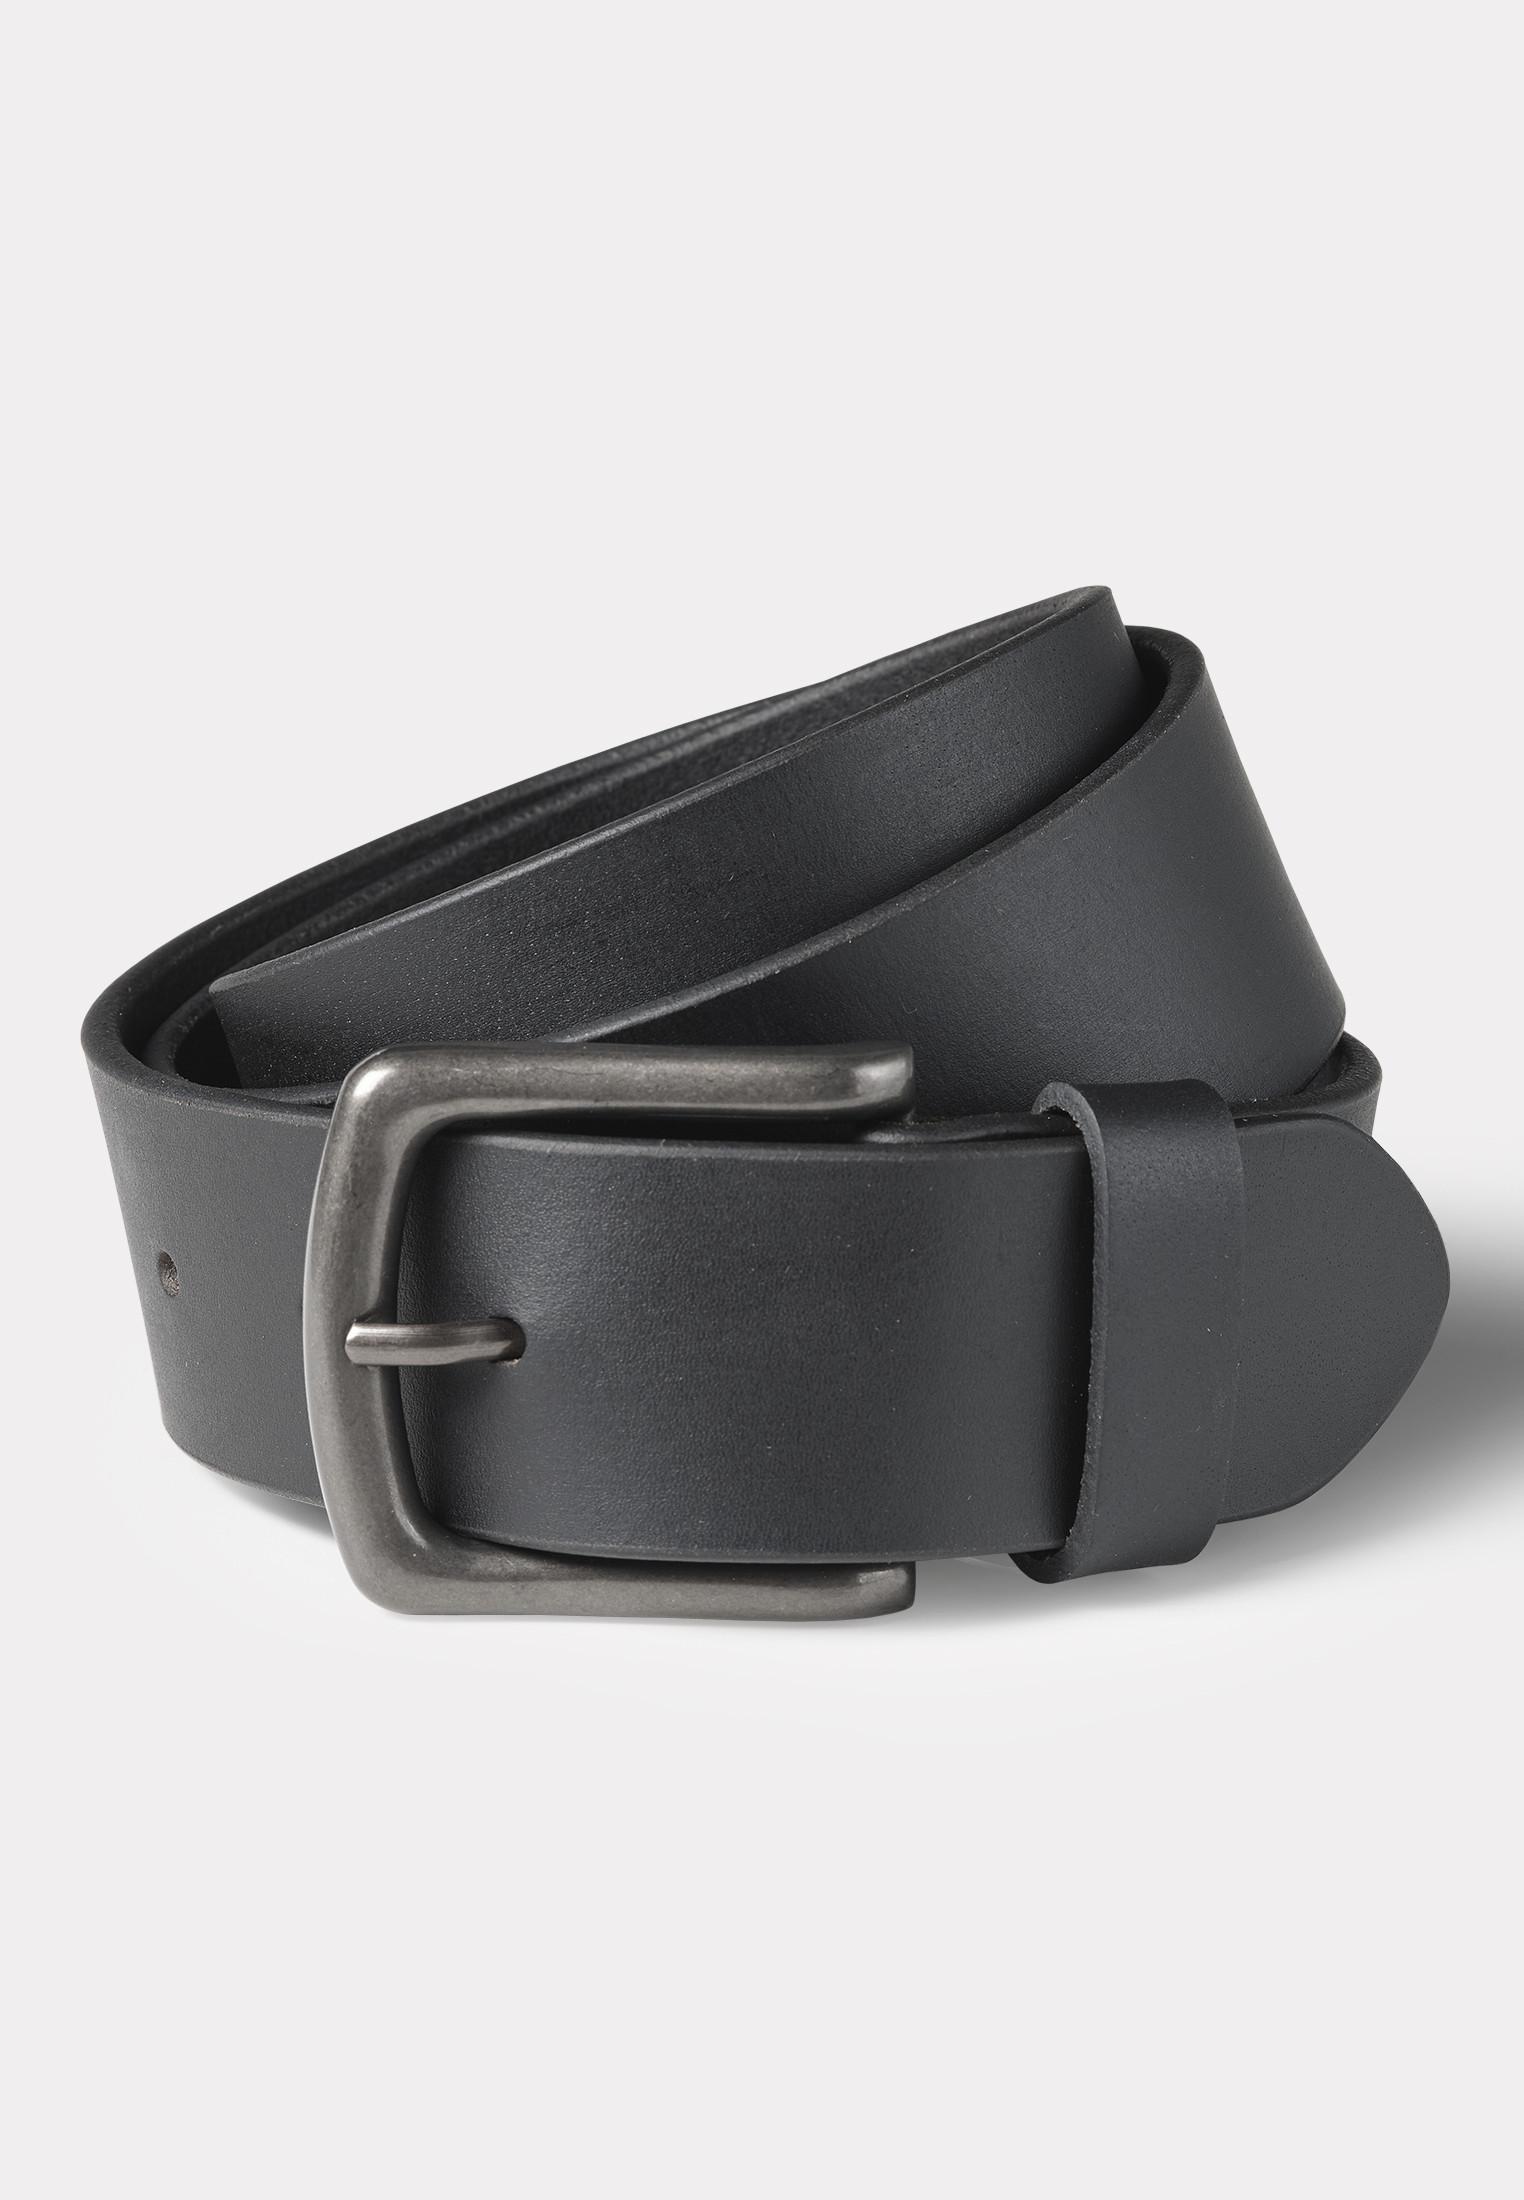 Hereford Black Leather Jean's Belt